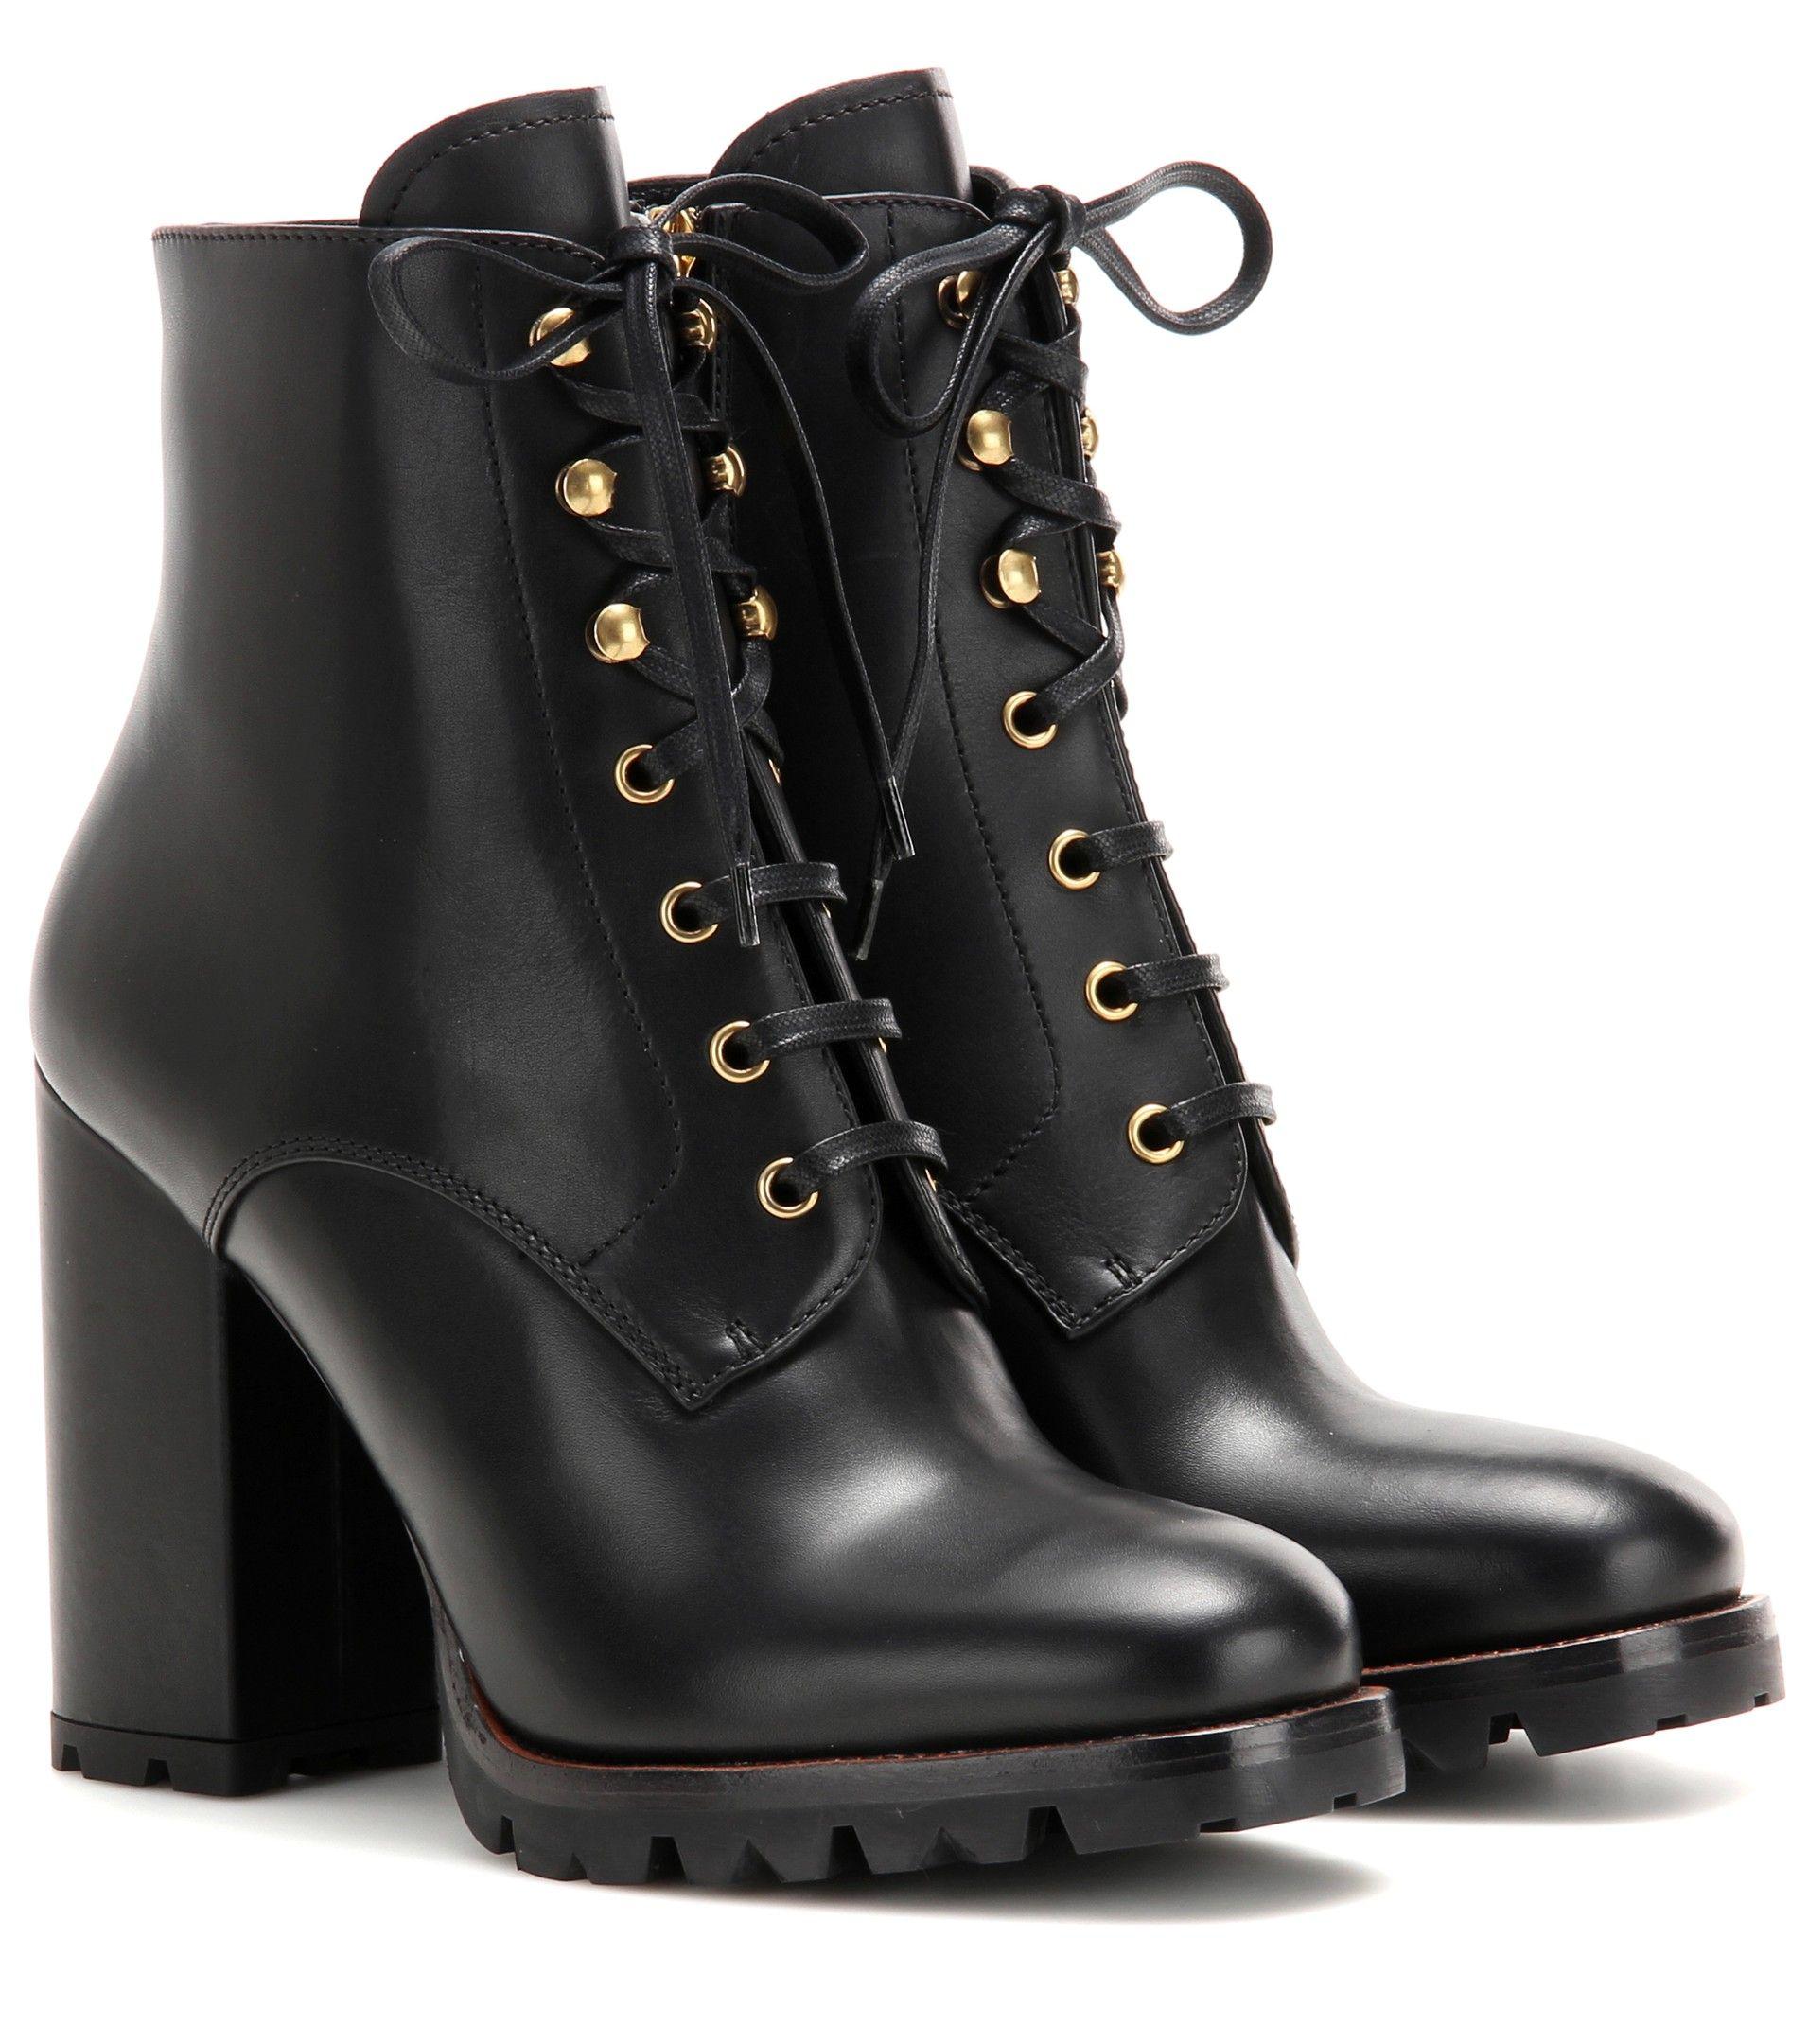 factory outlet online Prada Leather Moto Ankle Boots get to buy amazon cheap online sale 100% original clearance geniue stockist 68U1Qvs